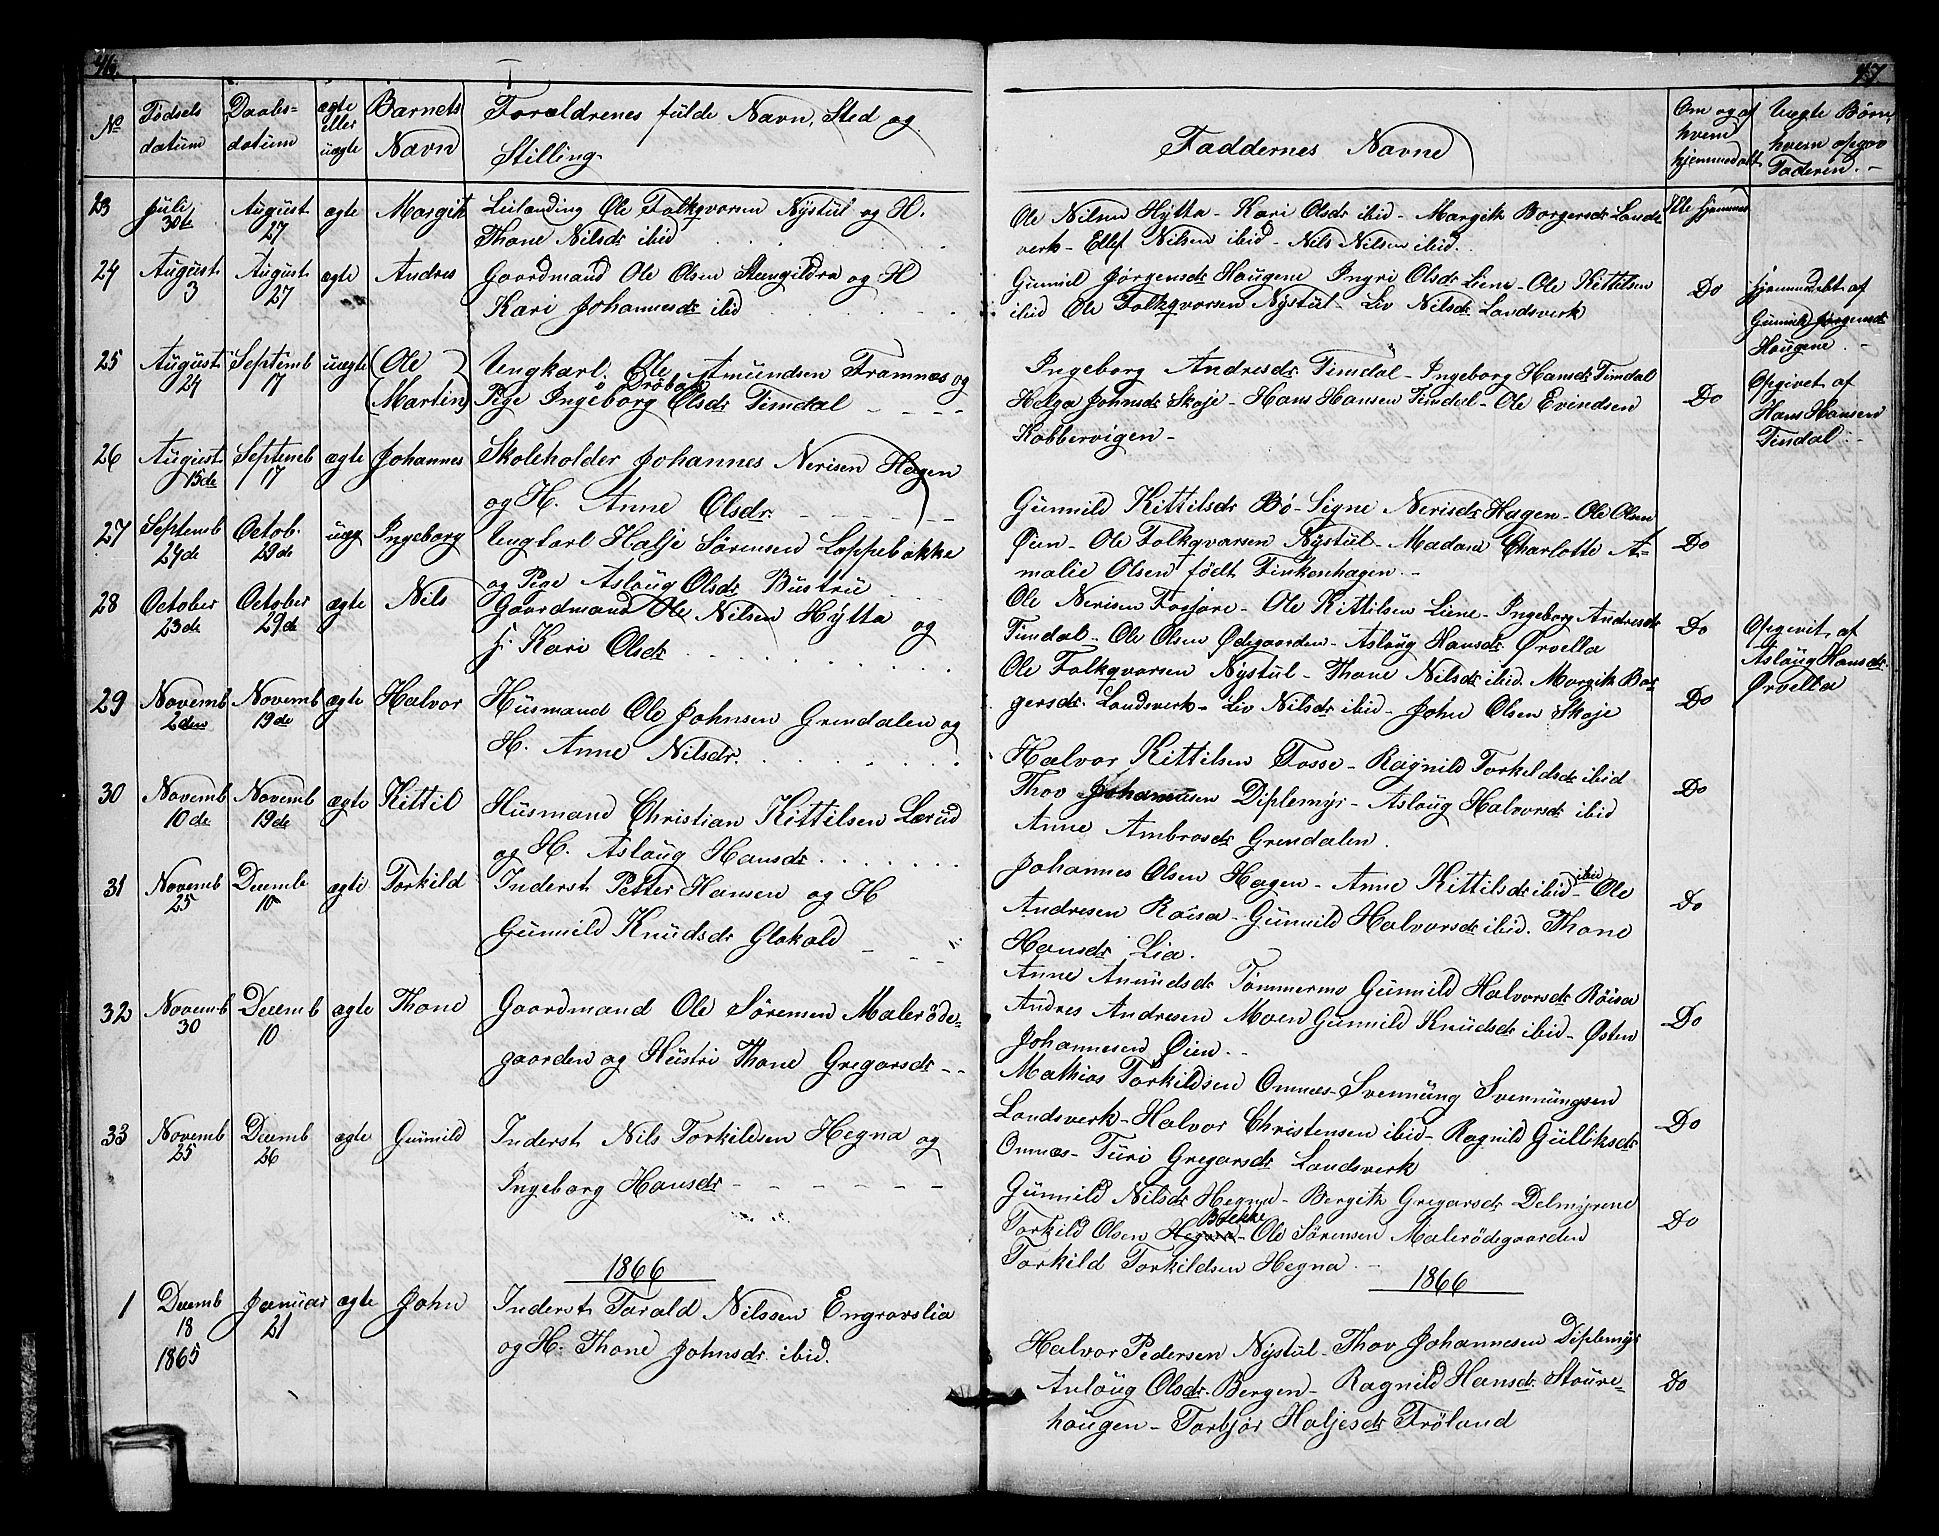 SAKO, Hjartdal kirkebøker, G/Gb/L0002: Klokkerbok nr. II 2, 1854-1884, s. 46-47